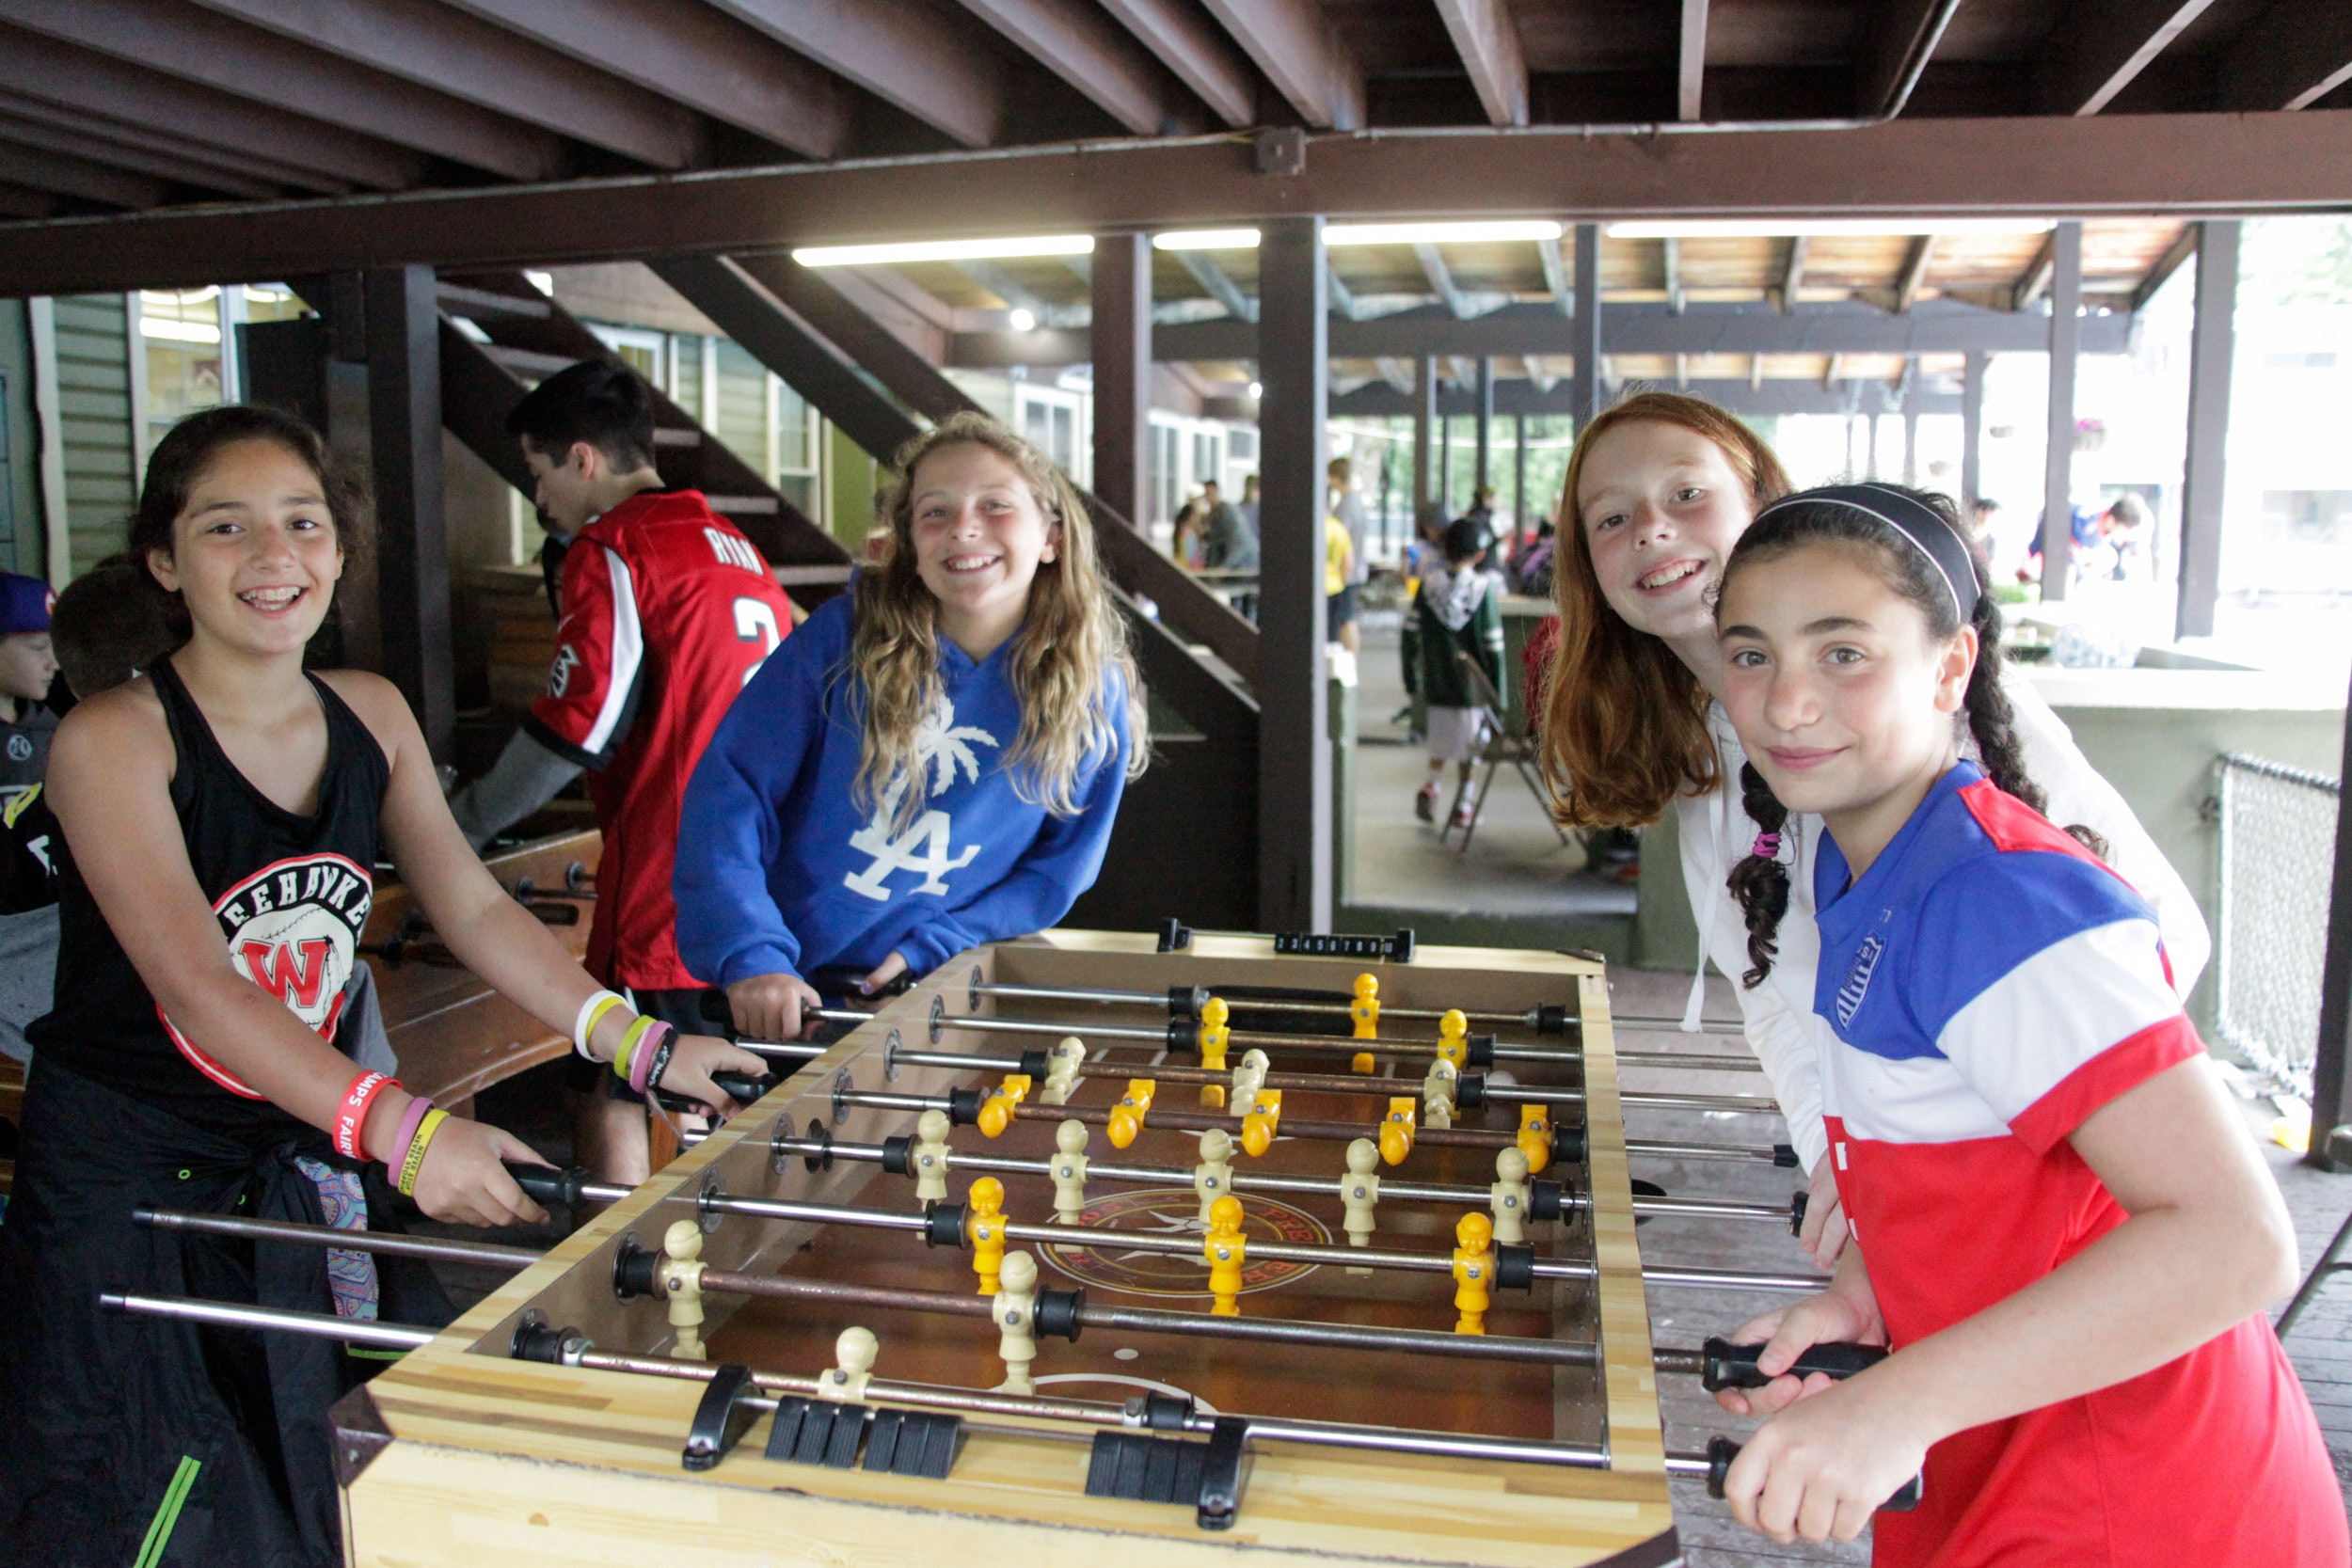 Deerkill day camp activities club choices.jpg?ixlib=rails 2.1